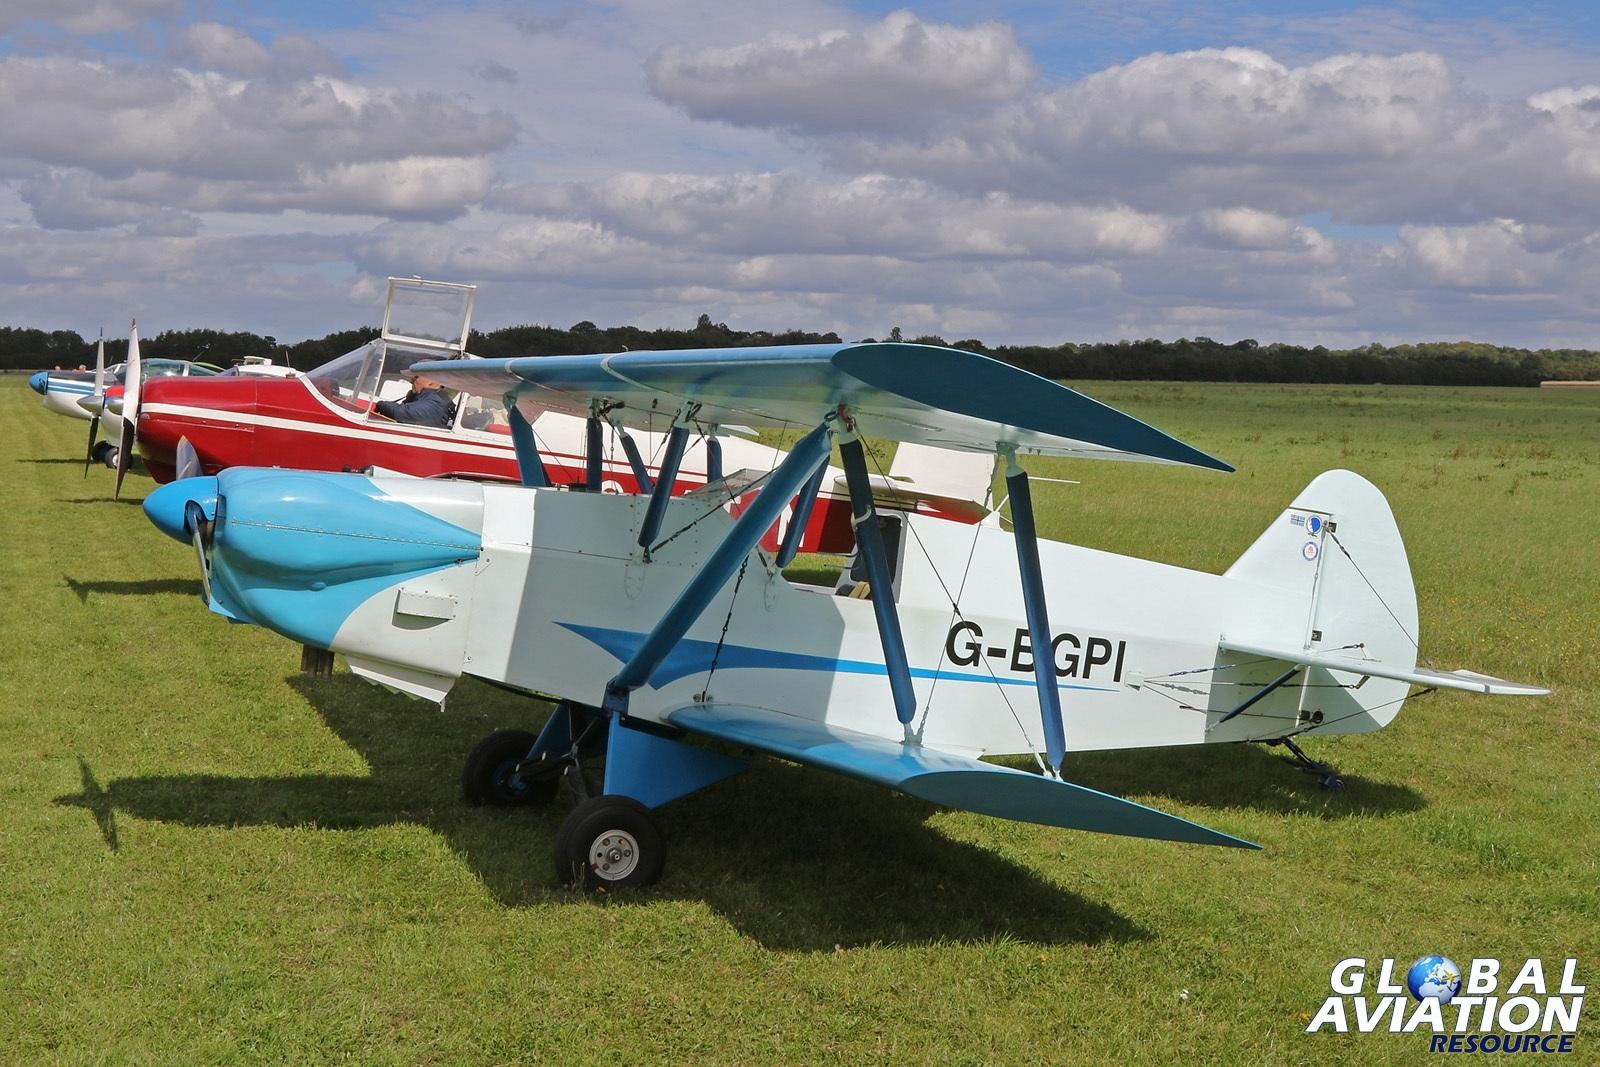 © Chris Wood - Global Aviation Resource